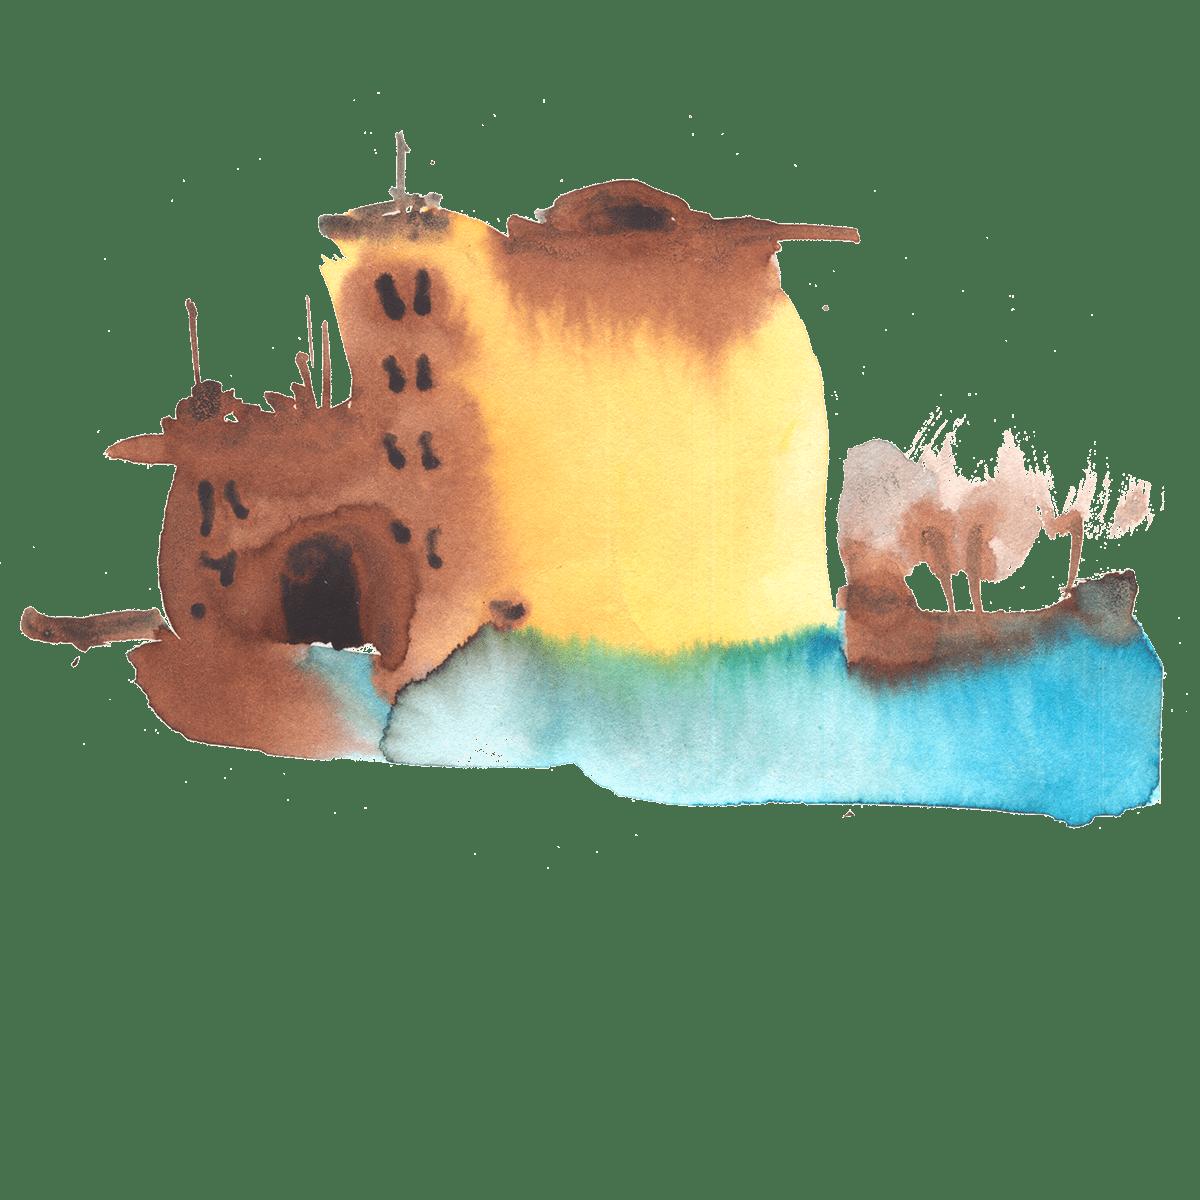 architacture graphic houses watercolor акварель архитектура графика питер